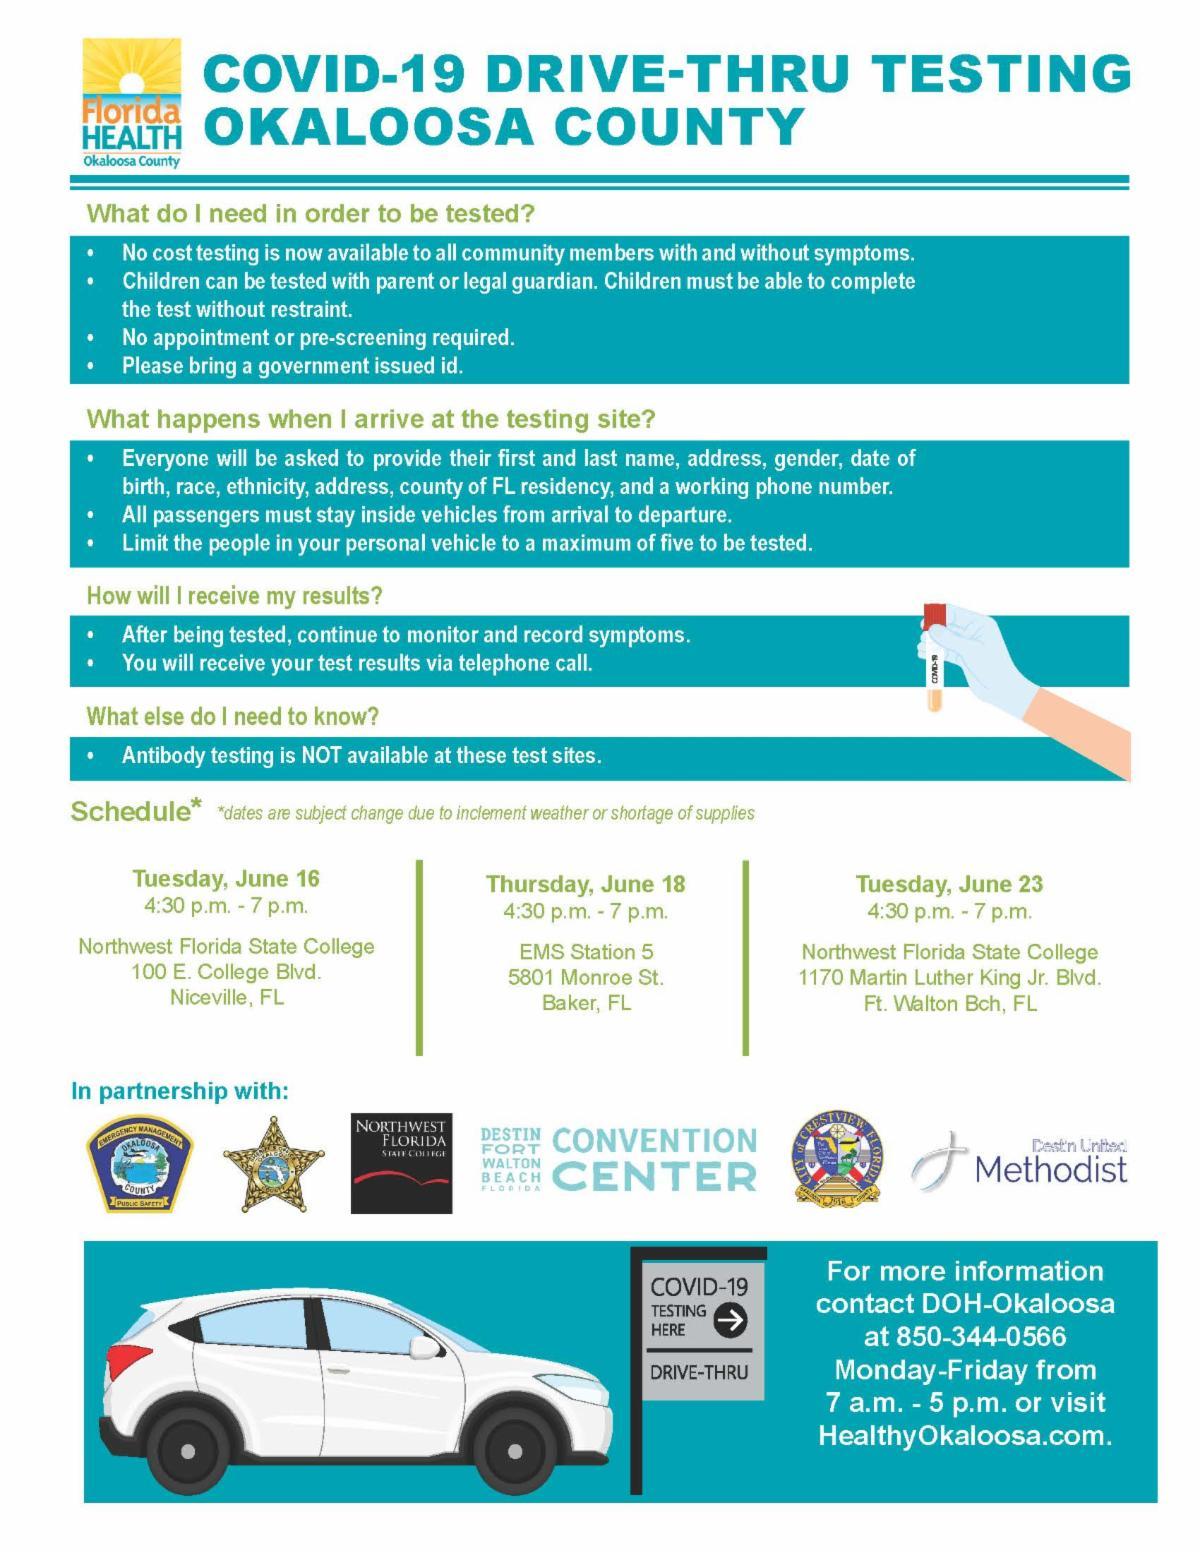 Okaloosa Drive-Thru COVID-19 Testing June 2020